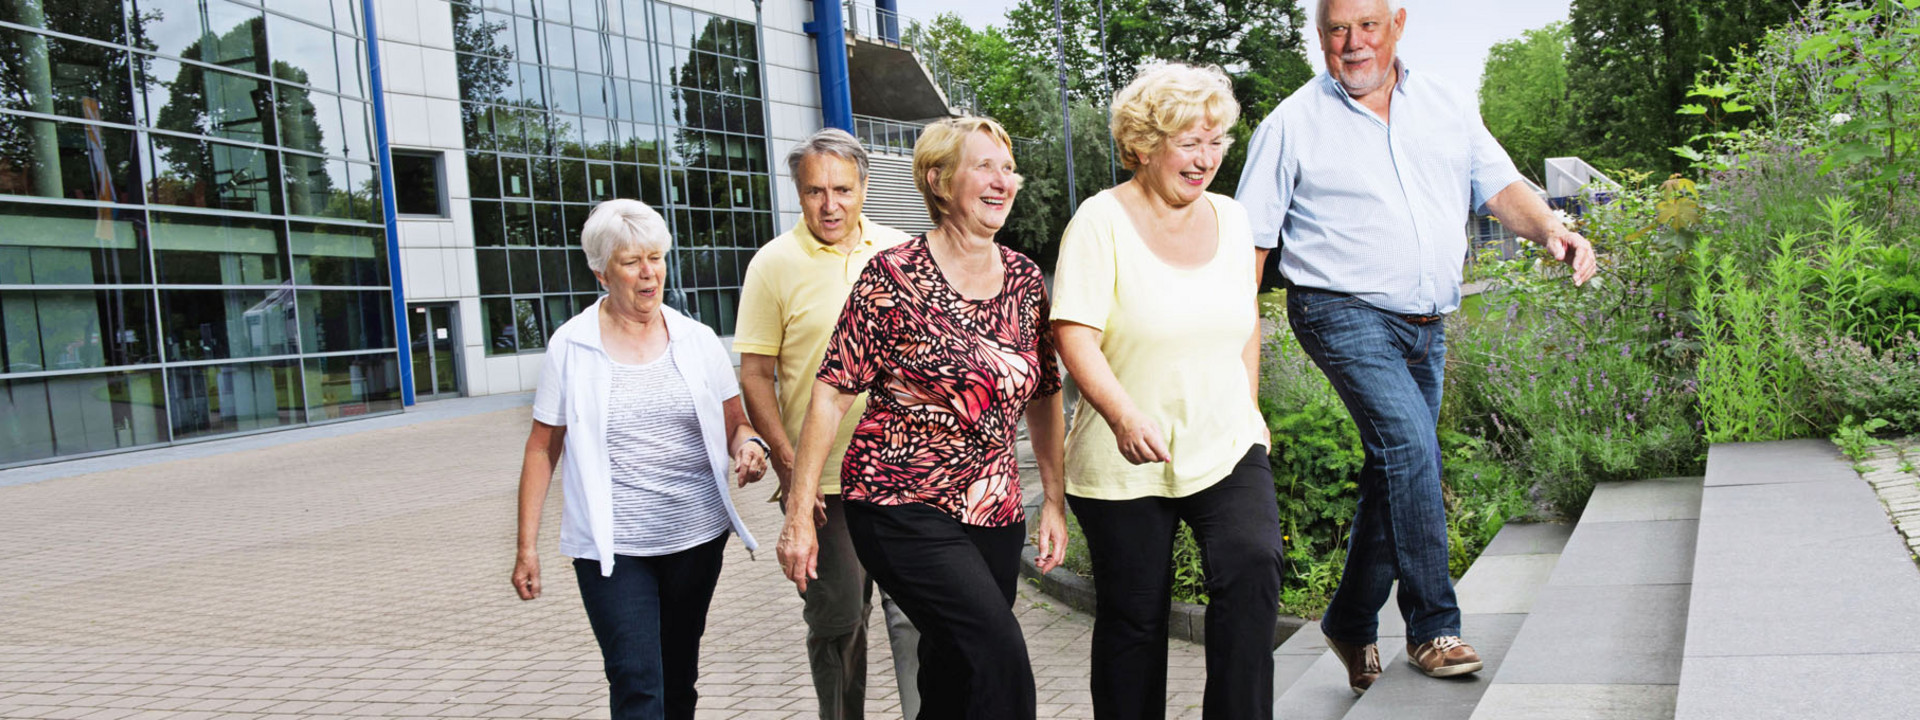 Teaser ATP: Ältere Leute laufen Treppe hinauf